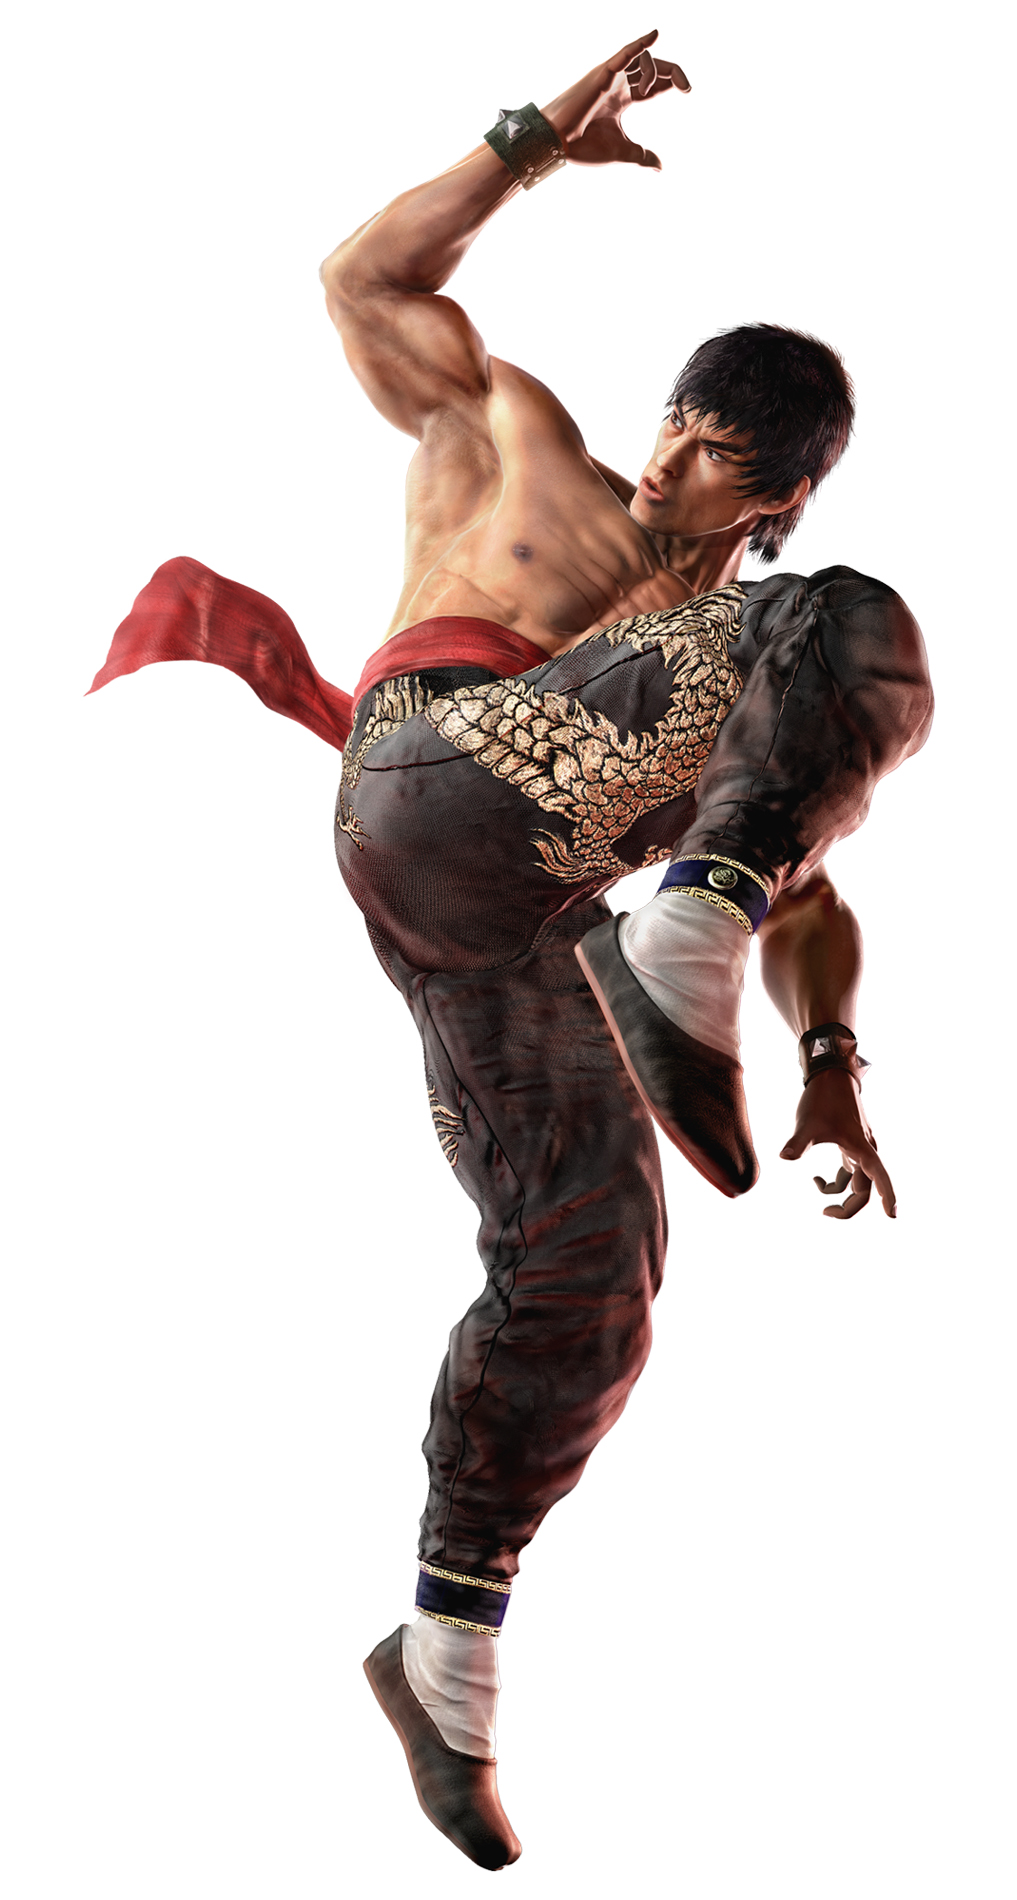 Tekken 6 - Character Artwork